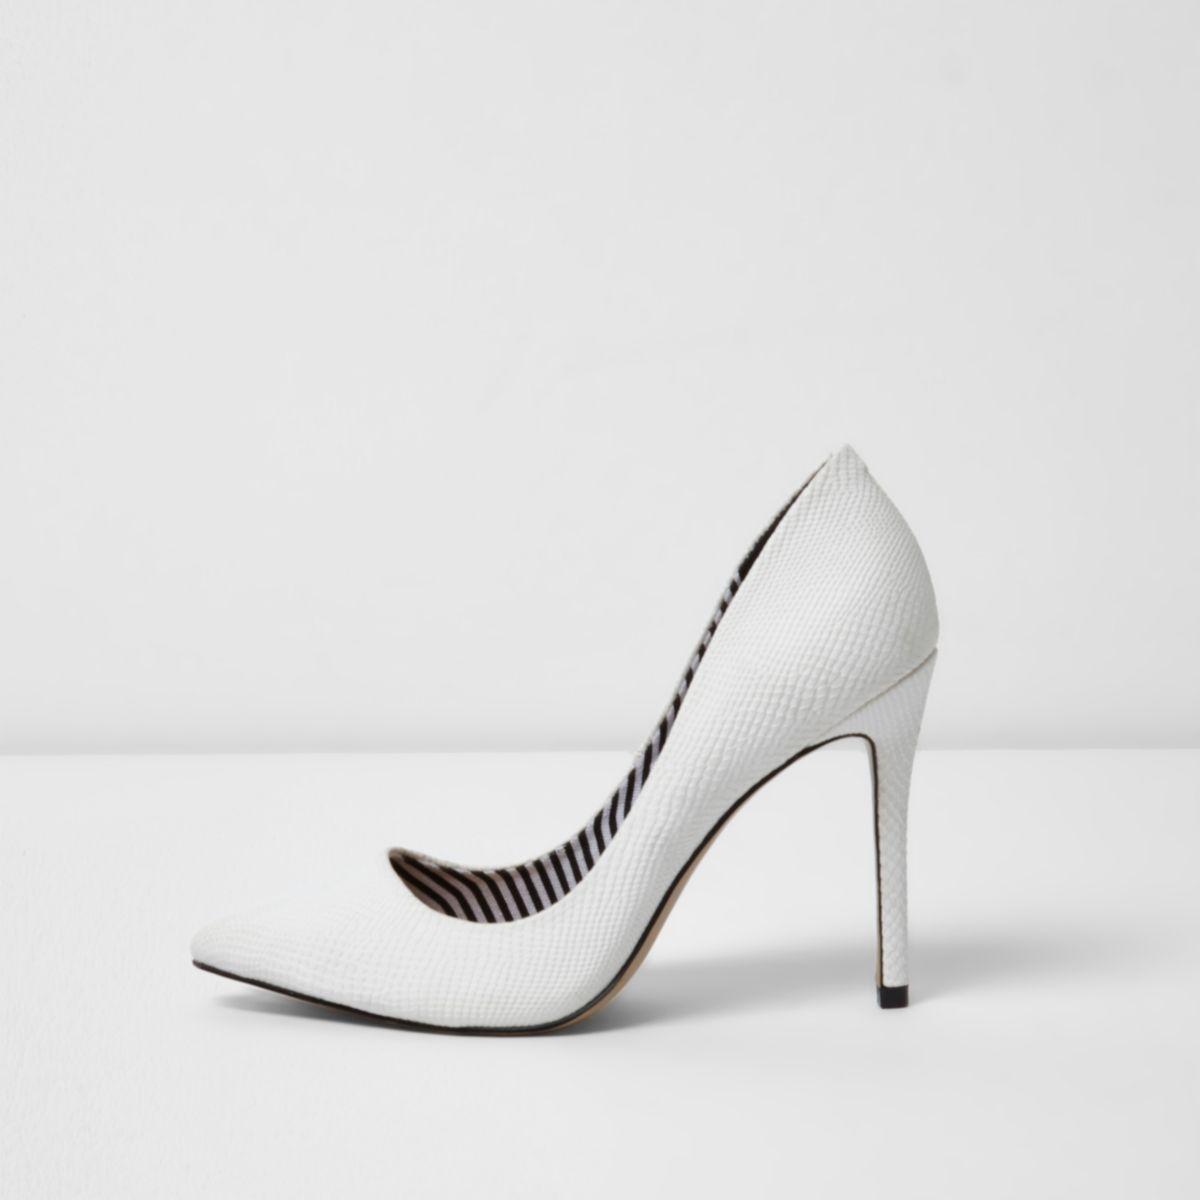 escarpins blancs chaussures bottes promos femme. Black Bedroom Furniture Sets. Home Design Ideas